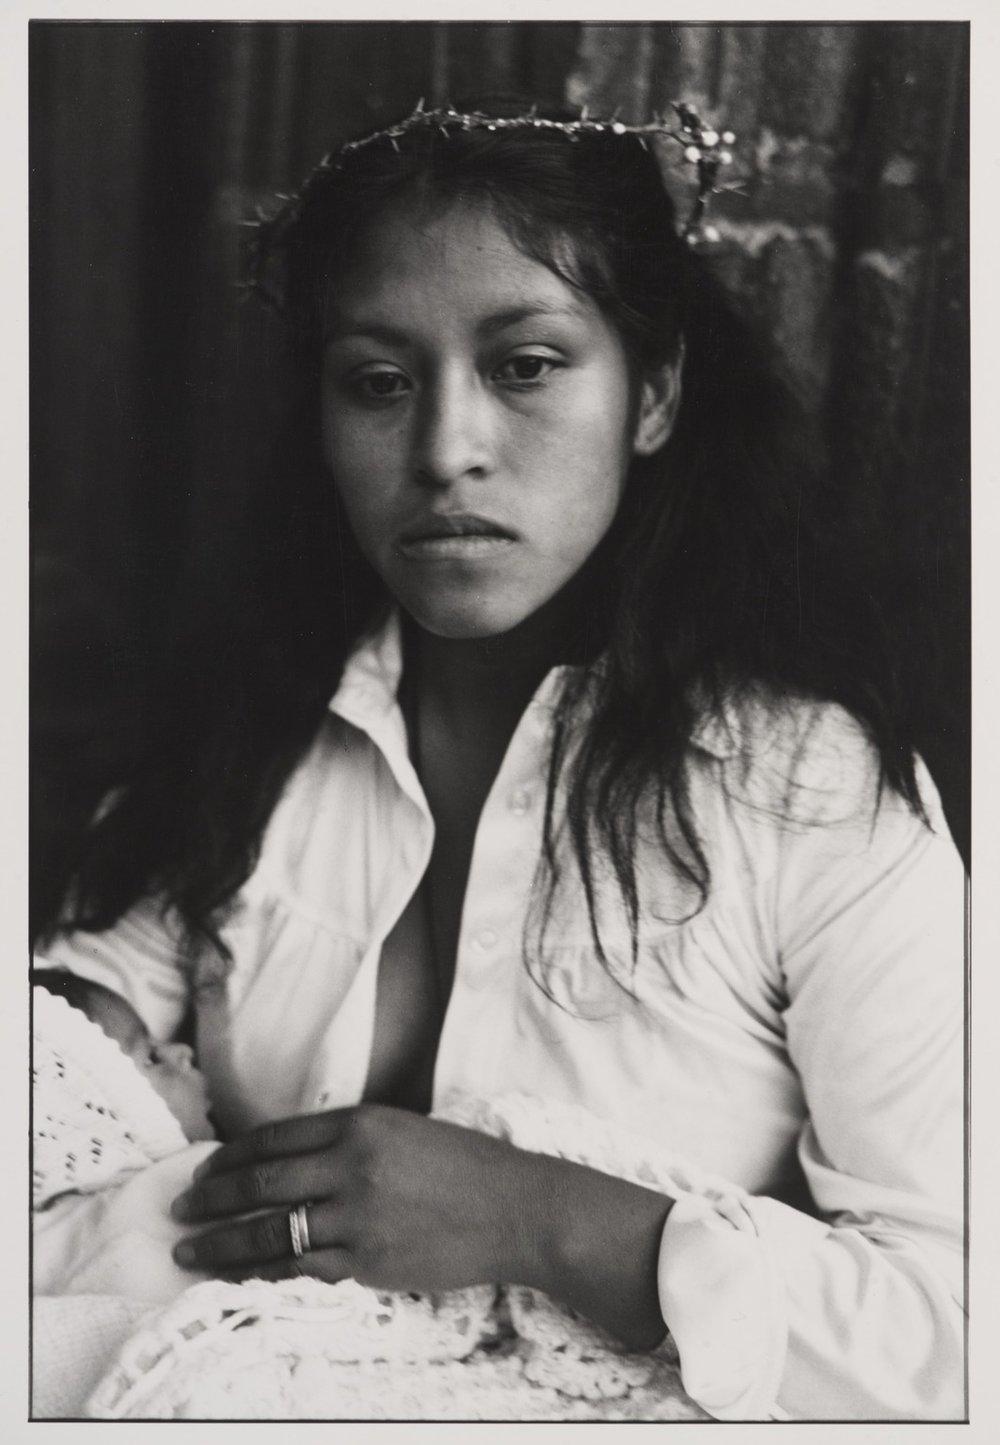 Graciela Iturbide    Madona,  México, 1980  24 x 20 inch Silver Gelatin Print